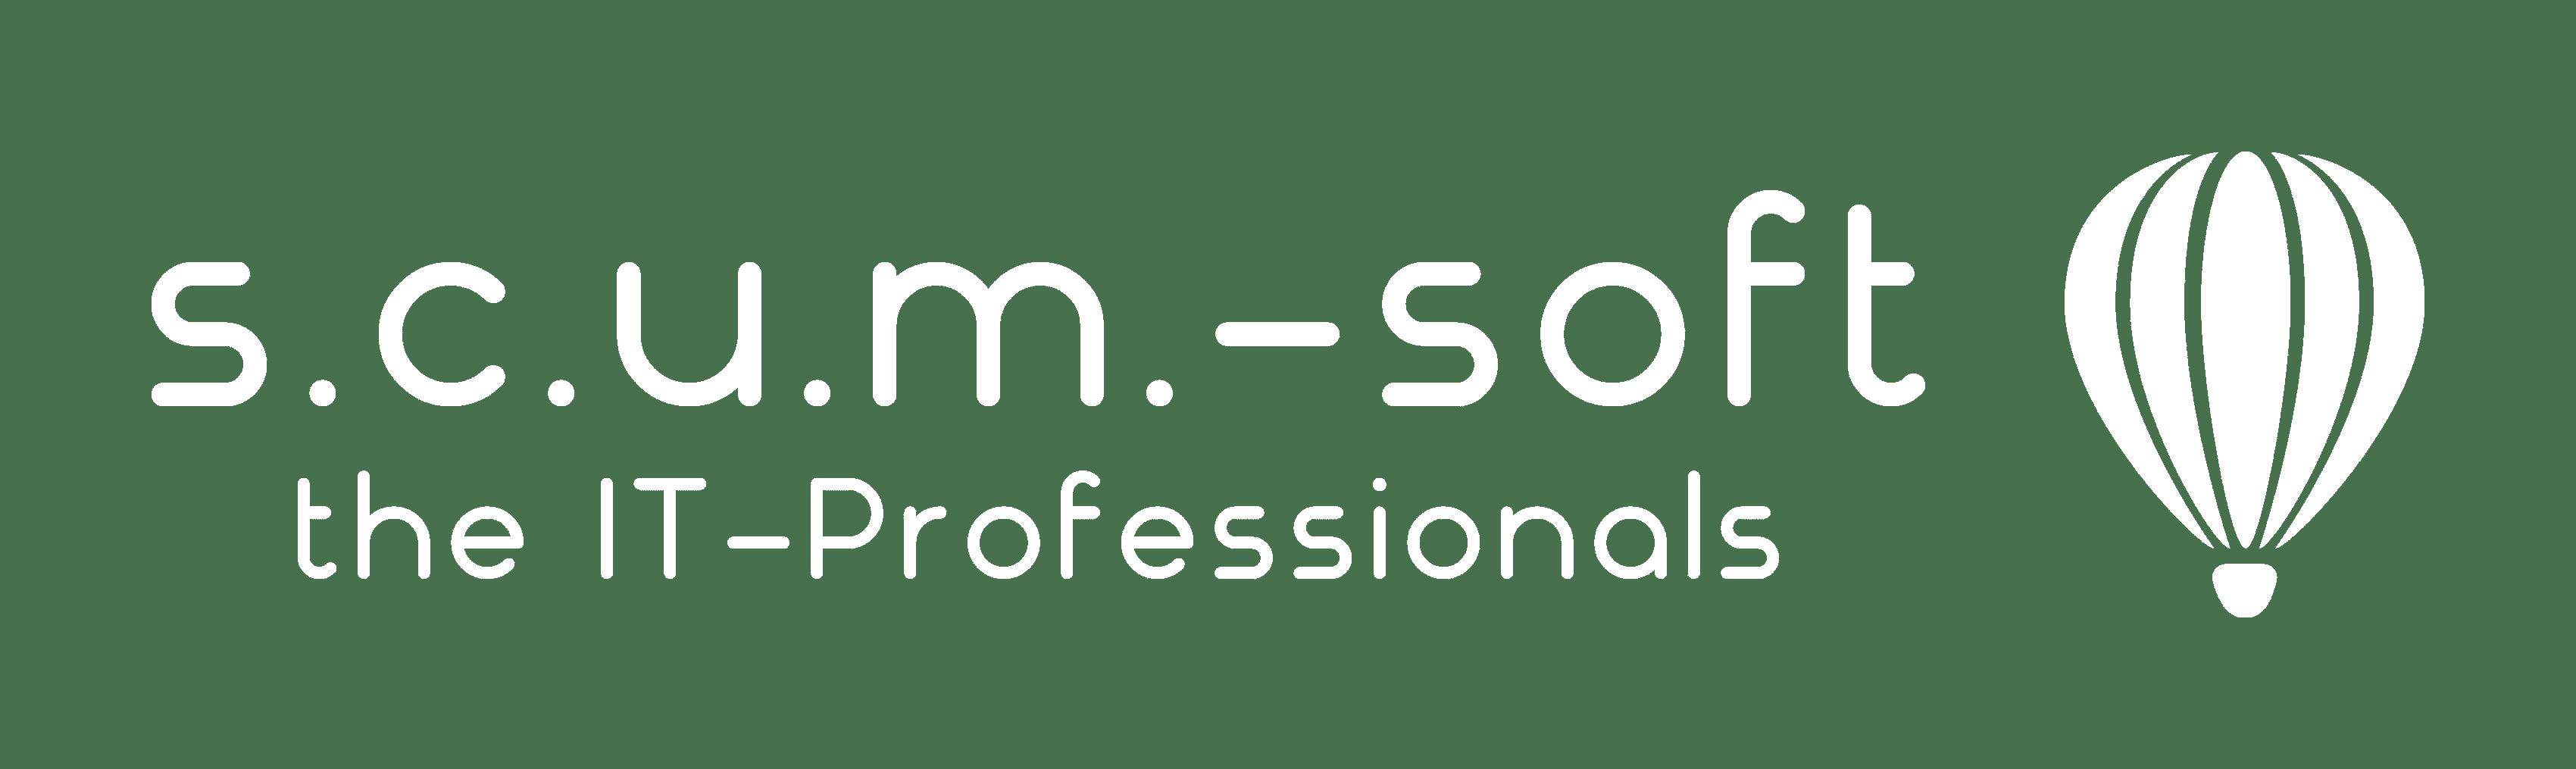 s.c.u.m.-soft